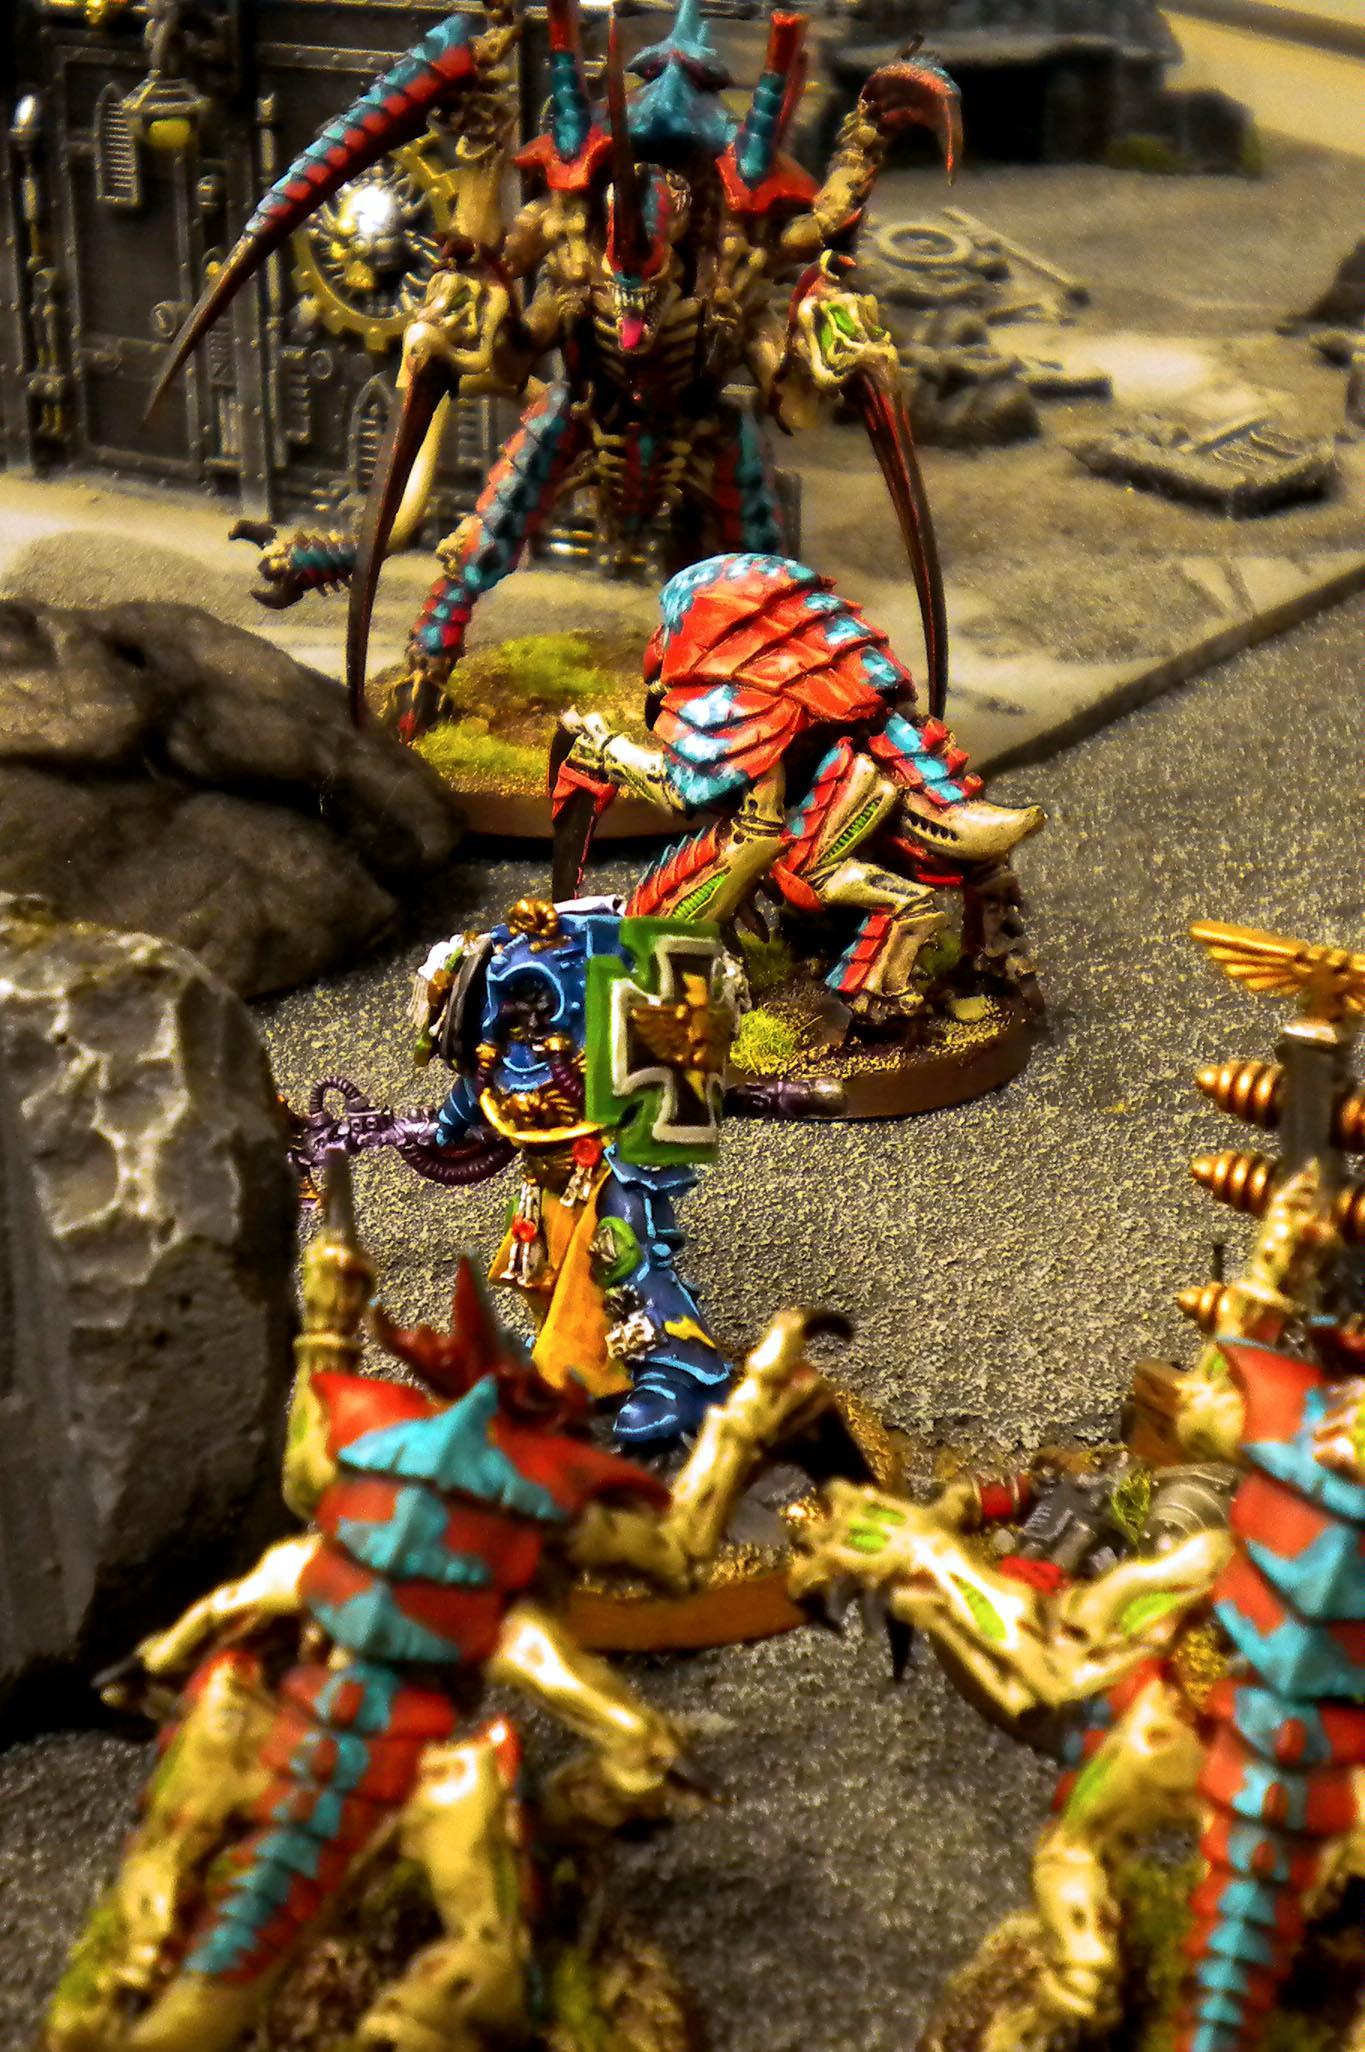 Space Marines, Swarm Lord, Tyranids, Warhammer 40,000